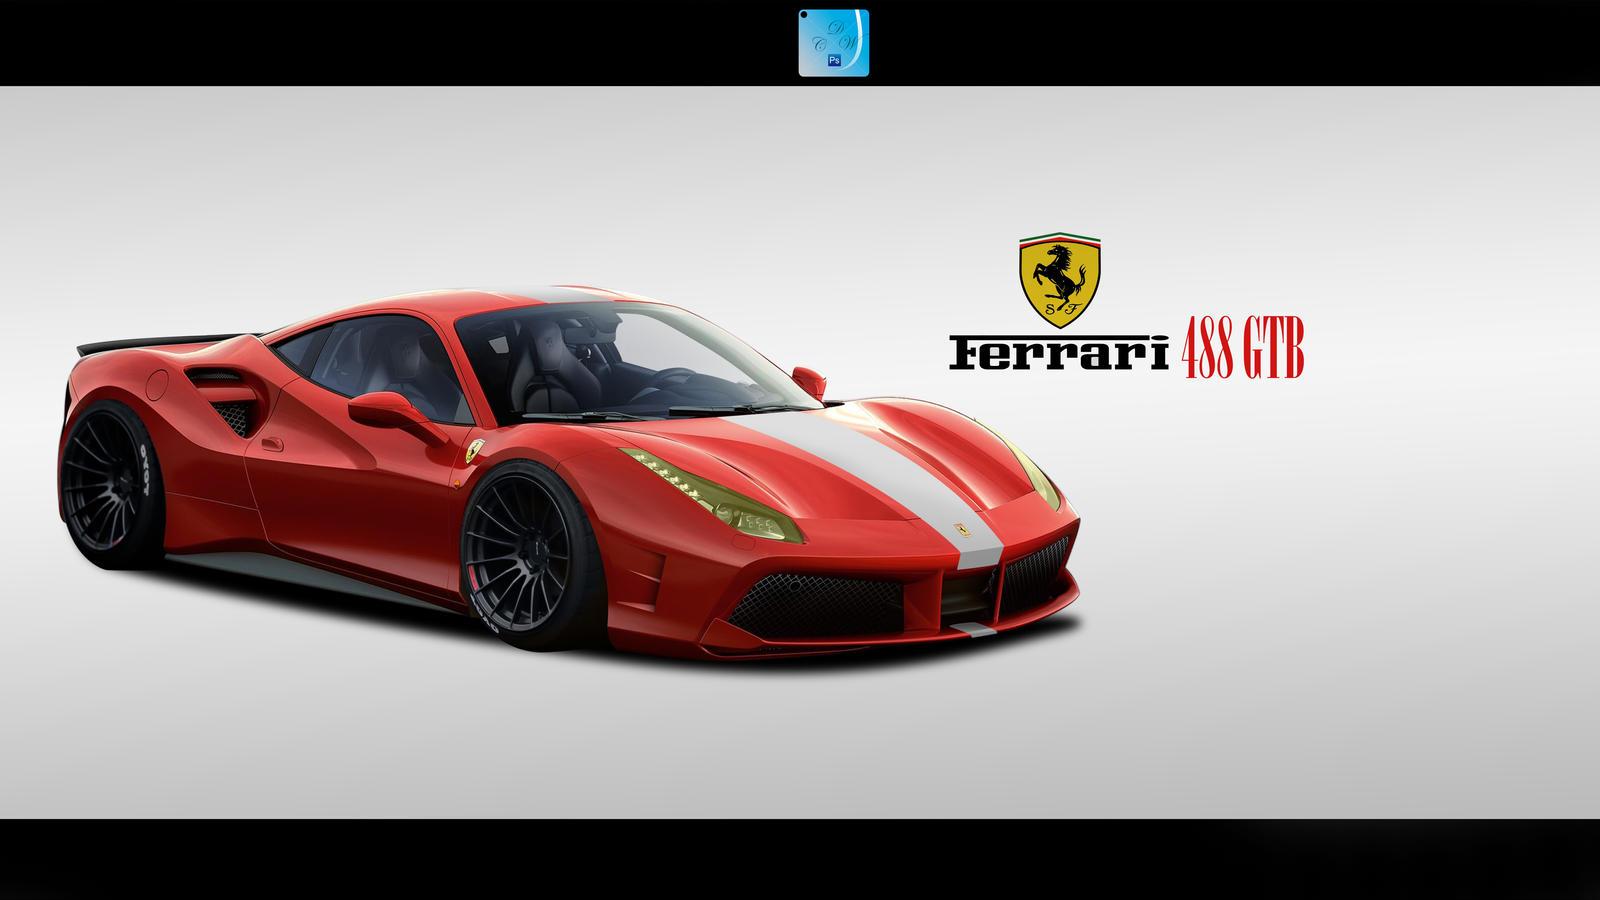 Group Of Ferrari 488 Wallpaper Windows 10